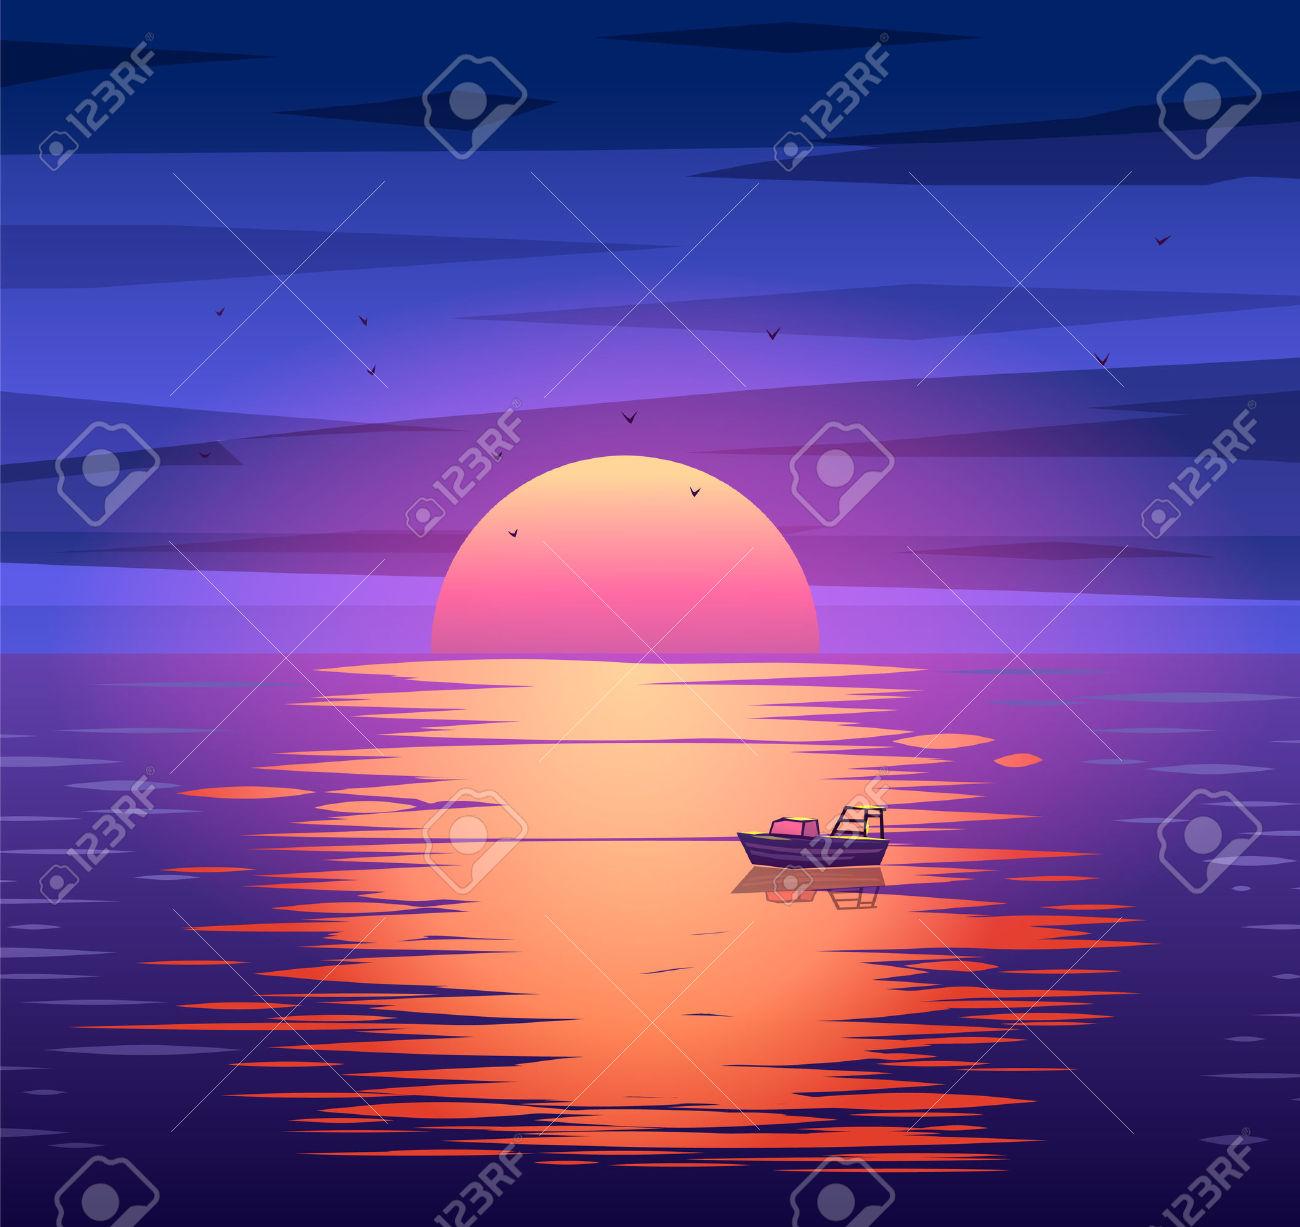 Evening Horizon Clip Art.